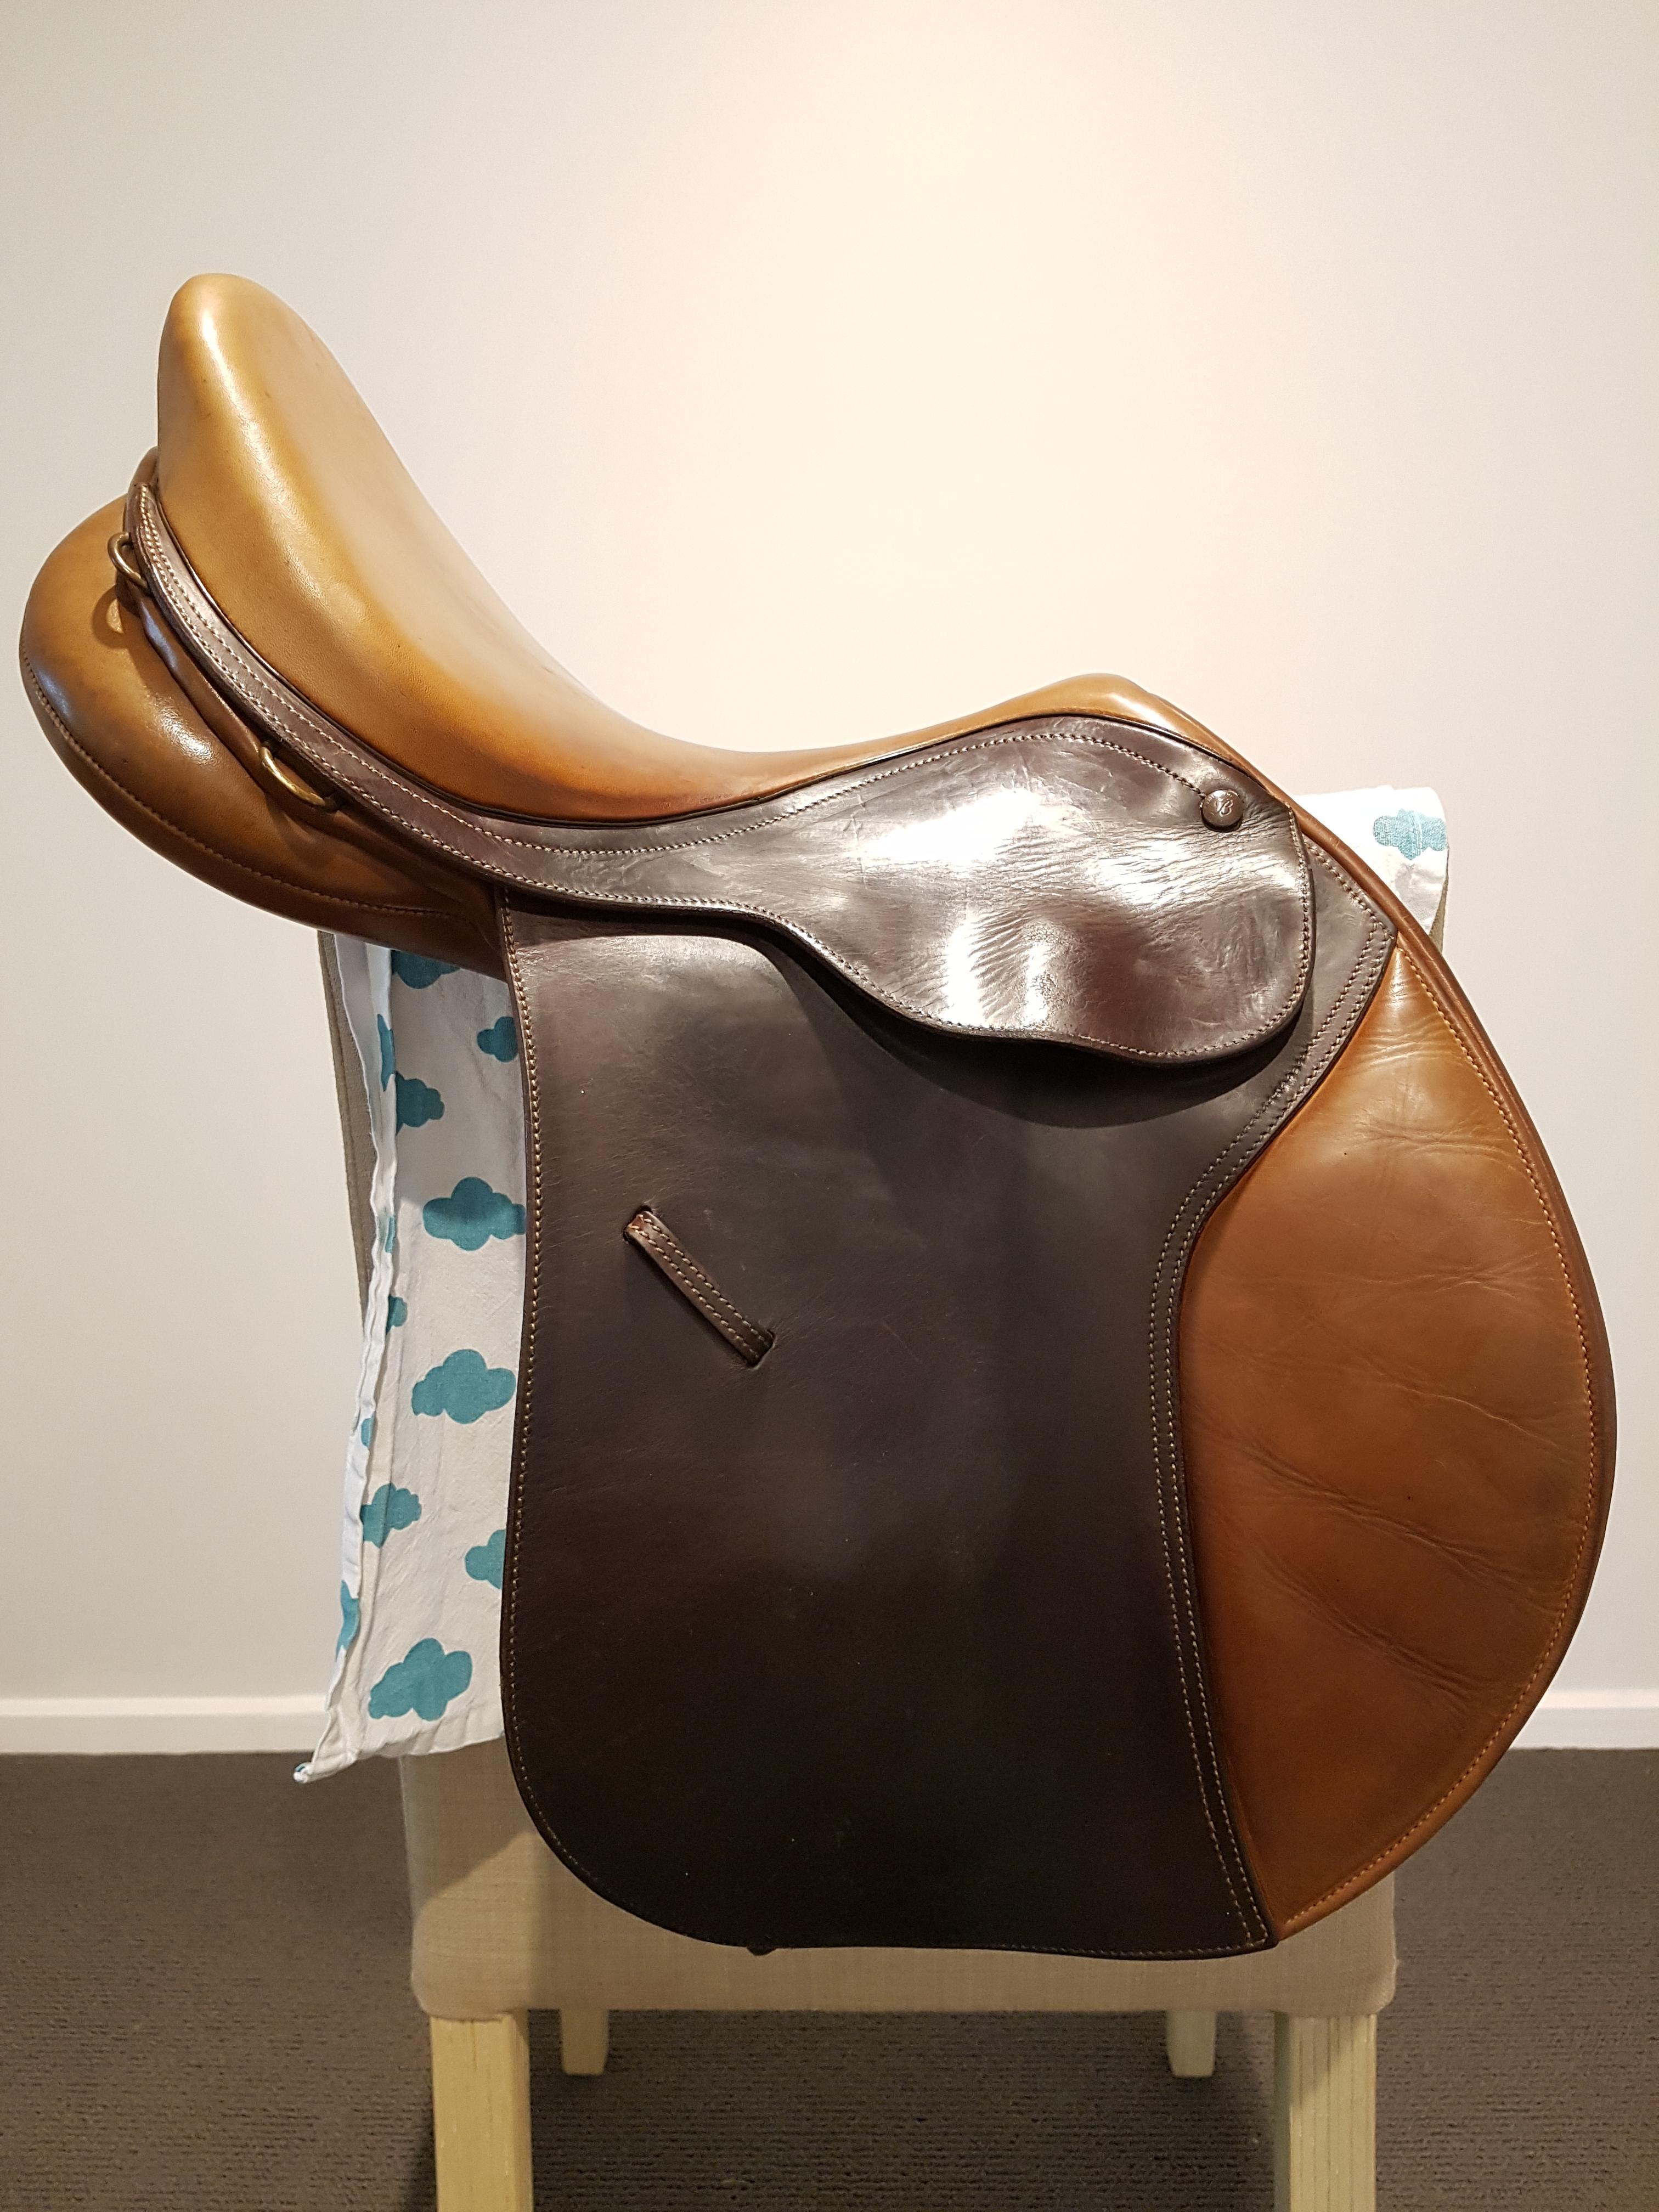 "16"" Bates Caprilli Jump Saddle"